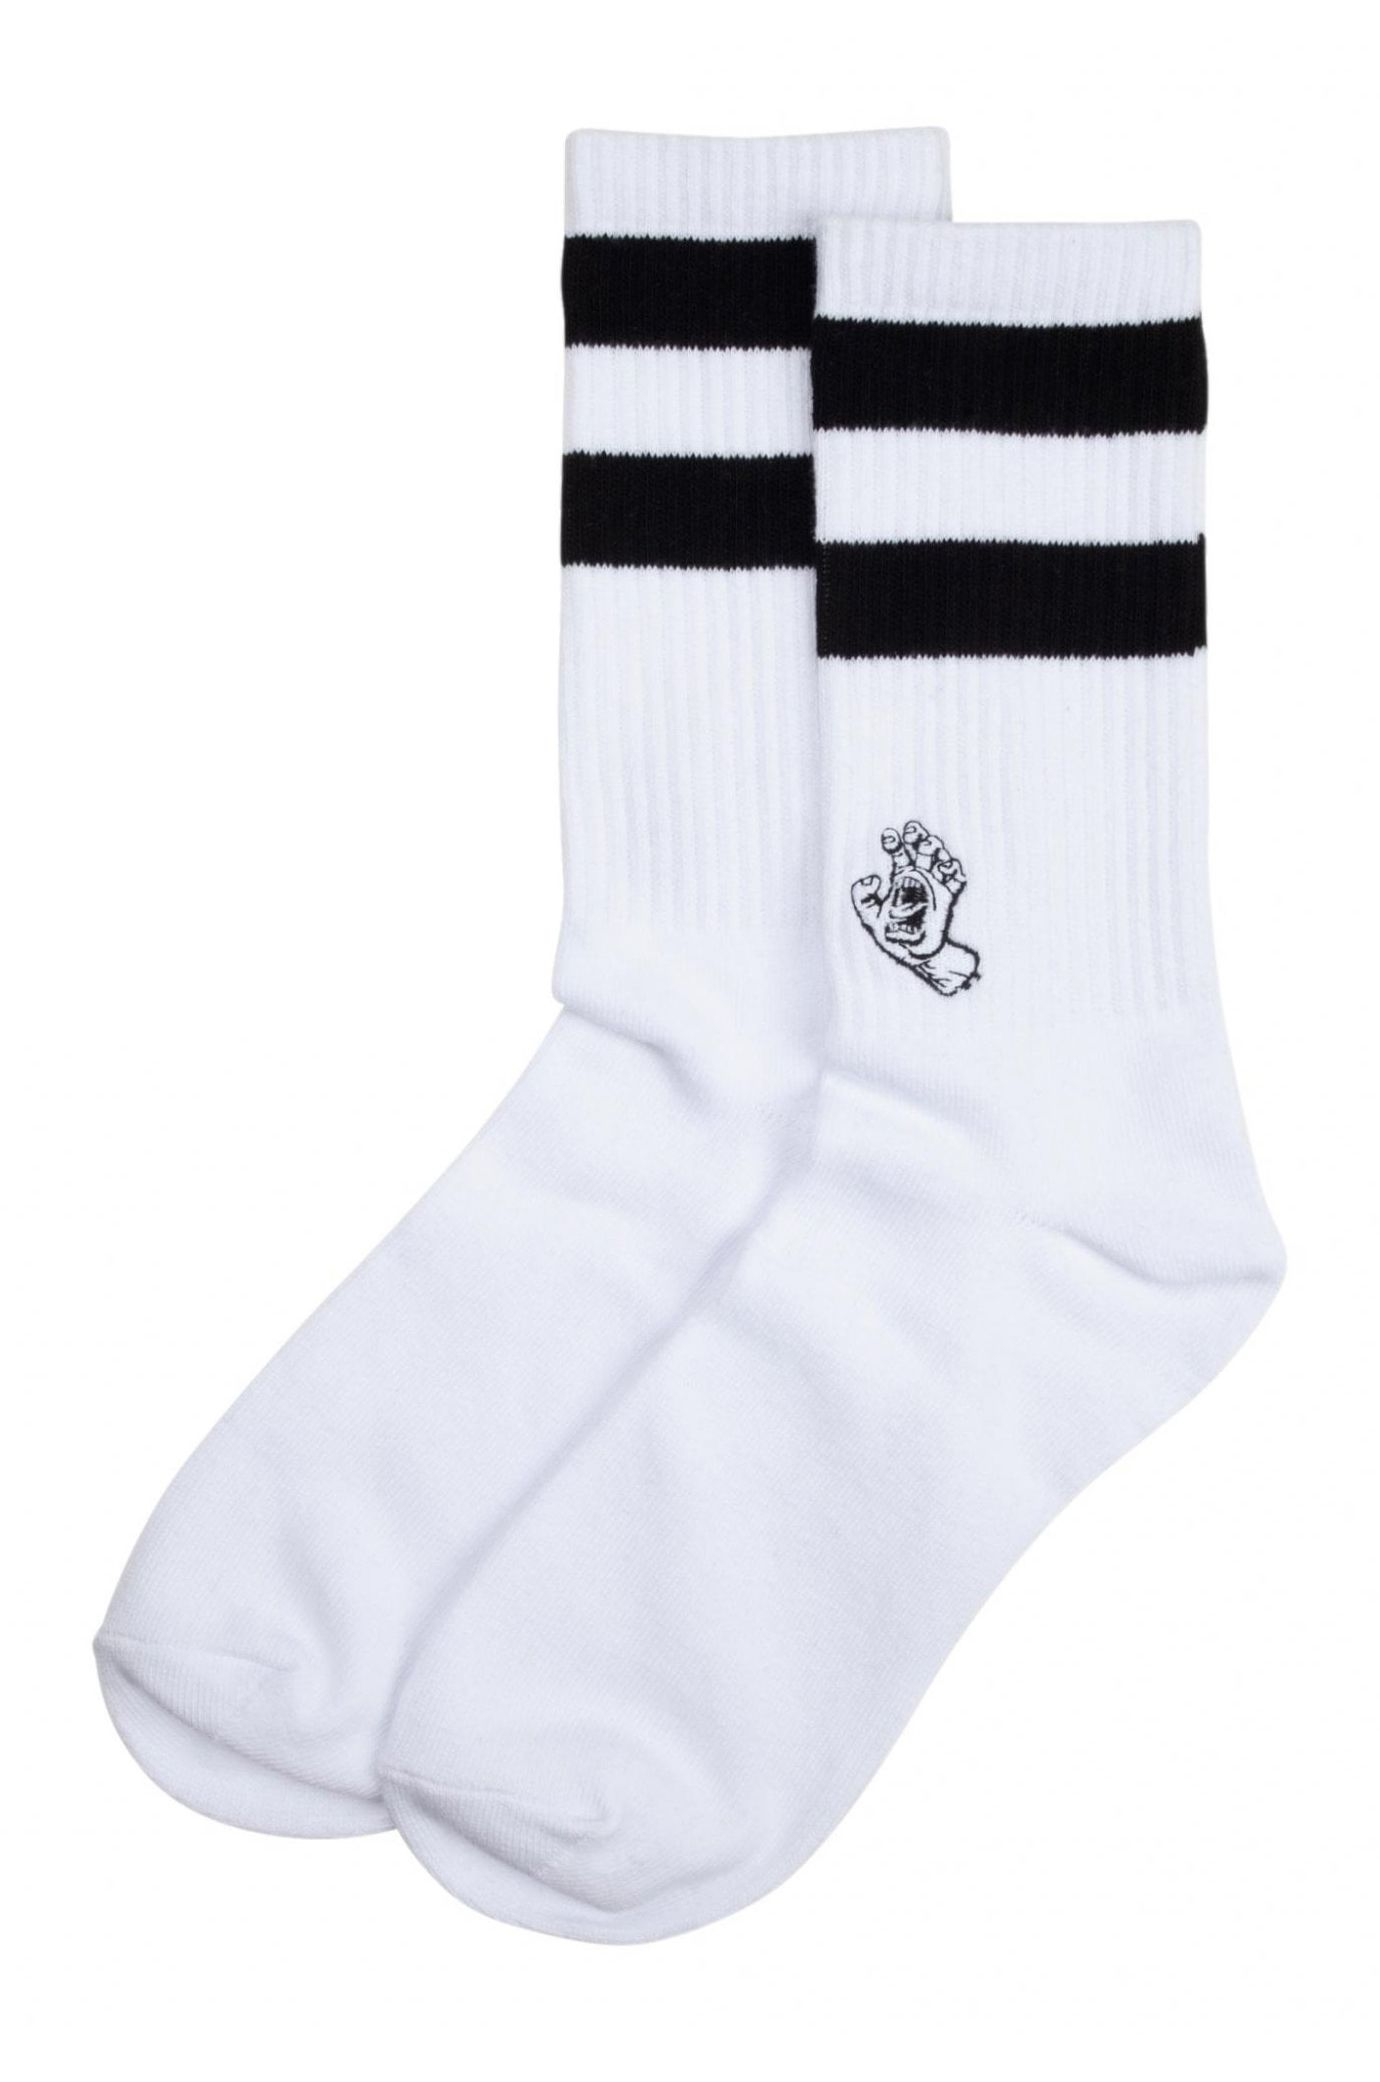 Santa Cruz Socks MINI MONO HAND TWIN STRIPE SOCKS White